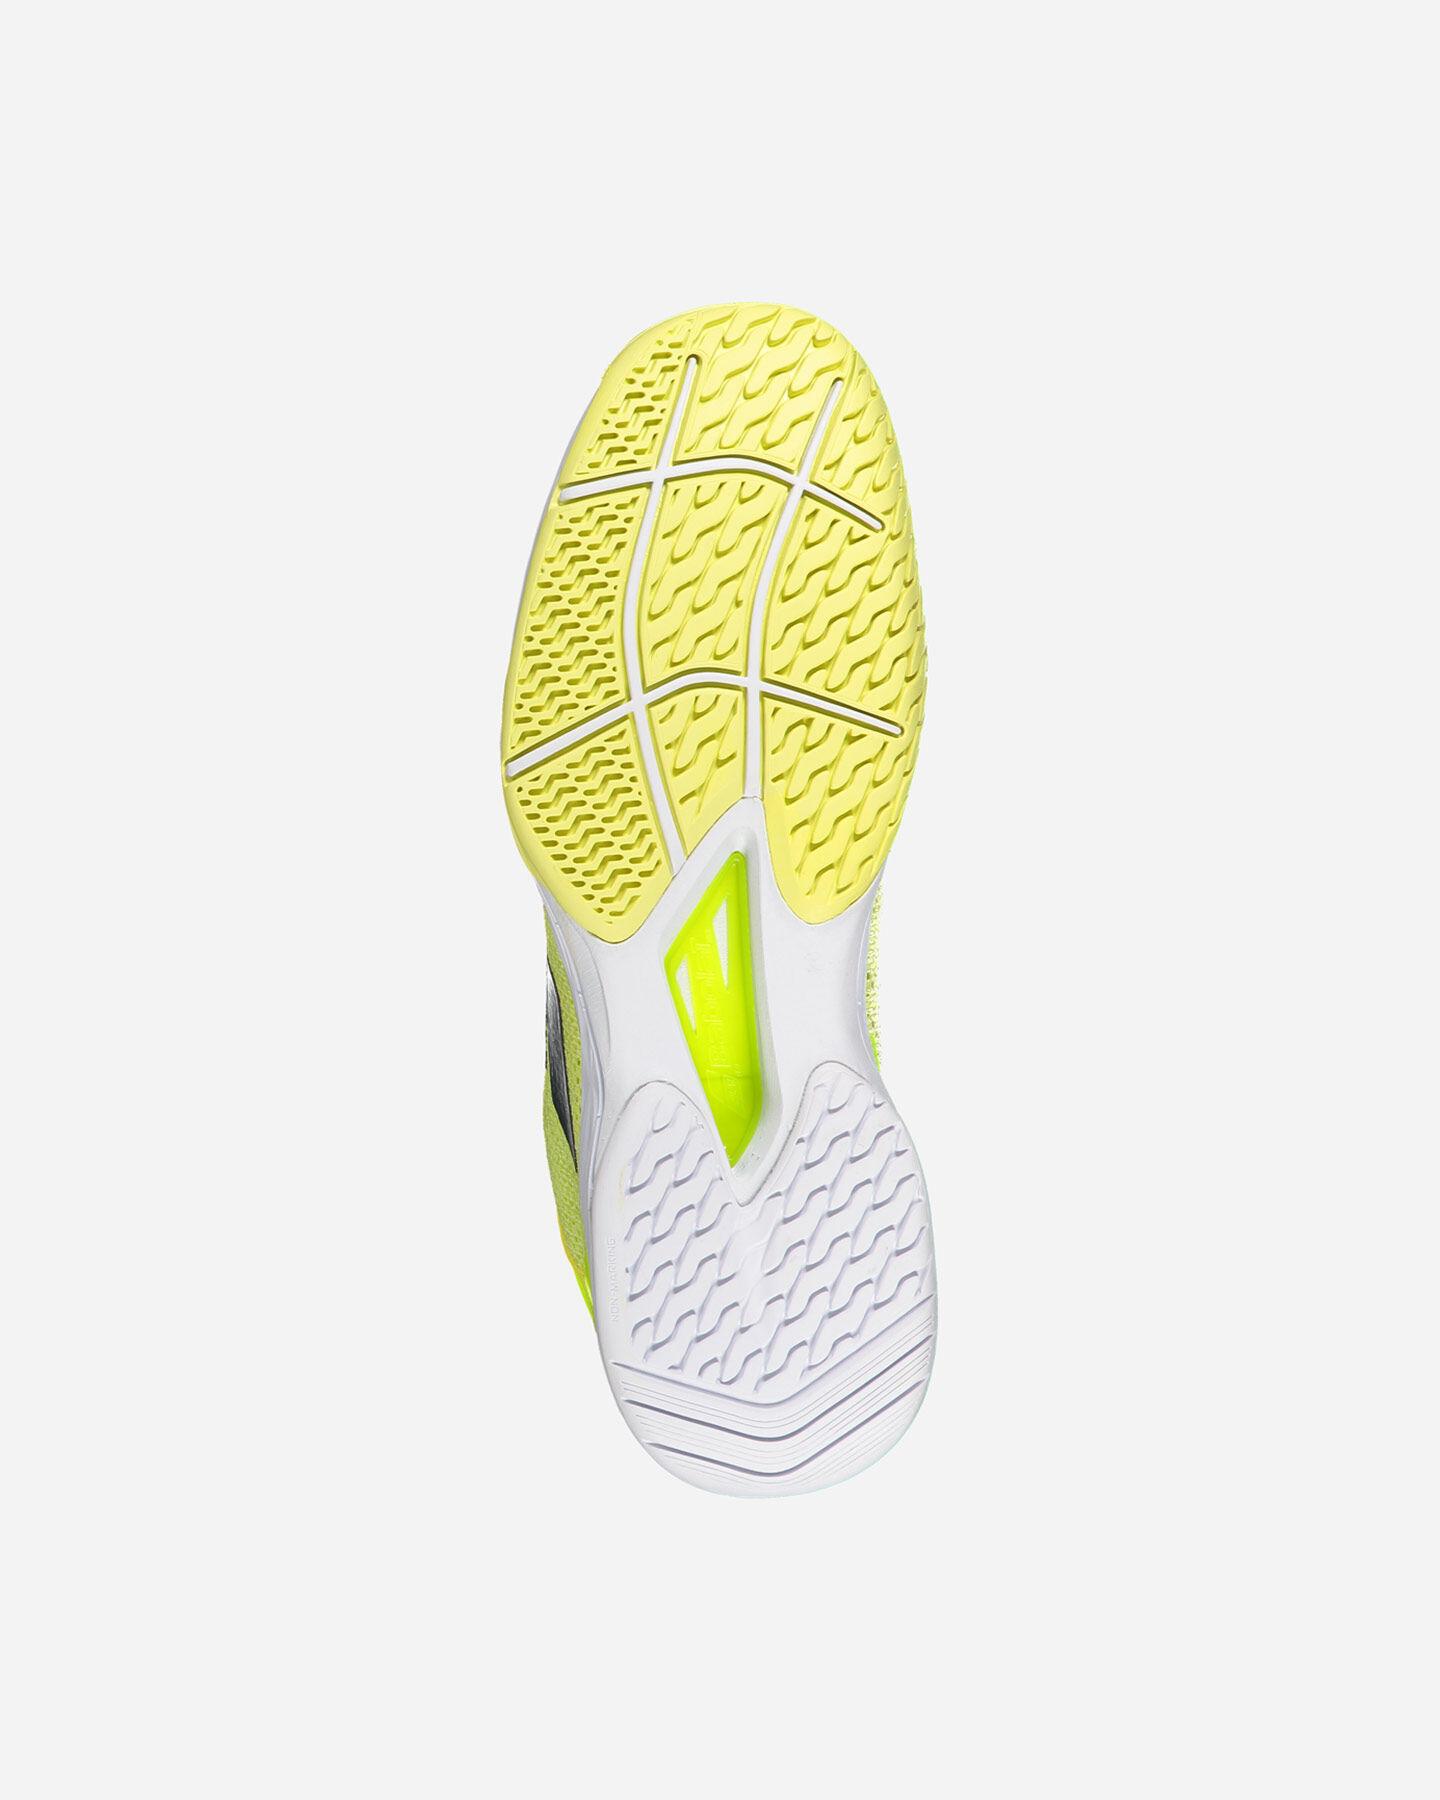 Scarpe tennis BABOLAT JET TERE AC W S5185882 scatto 2